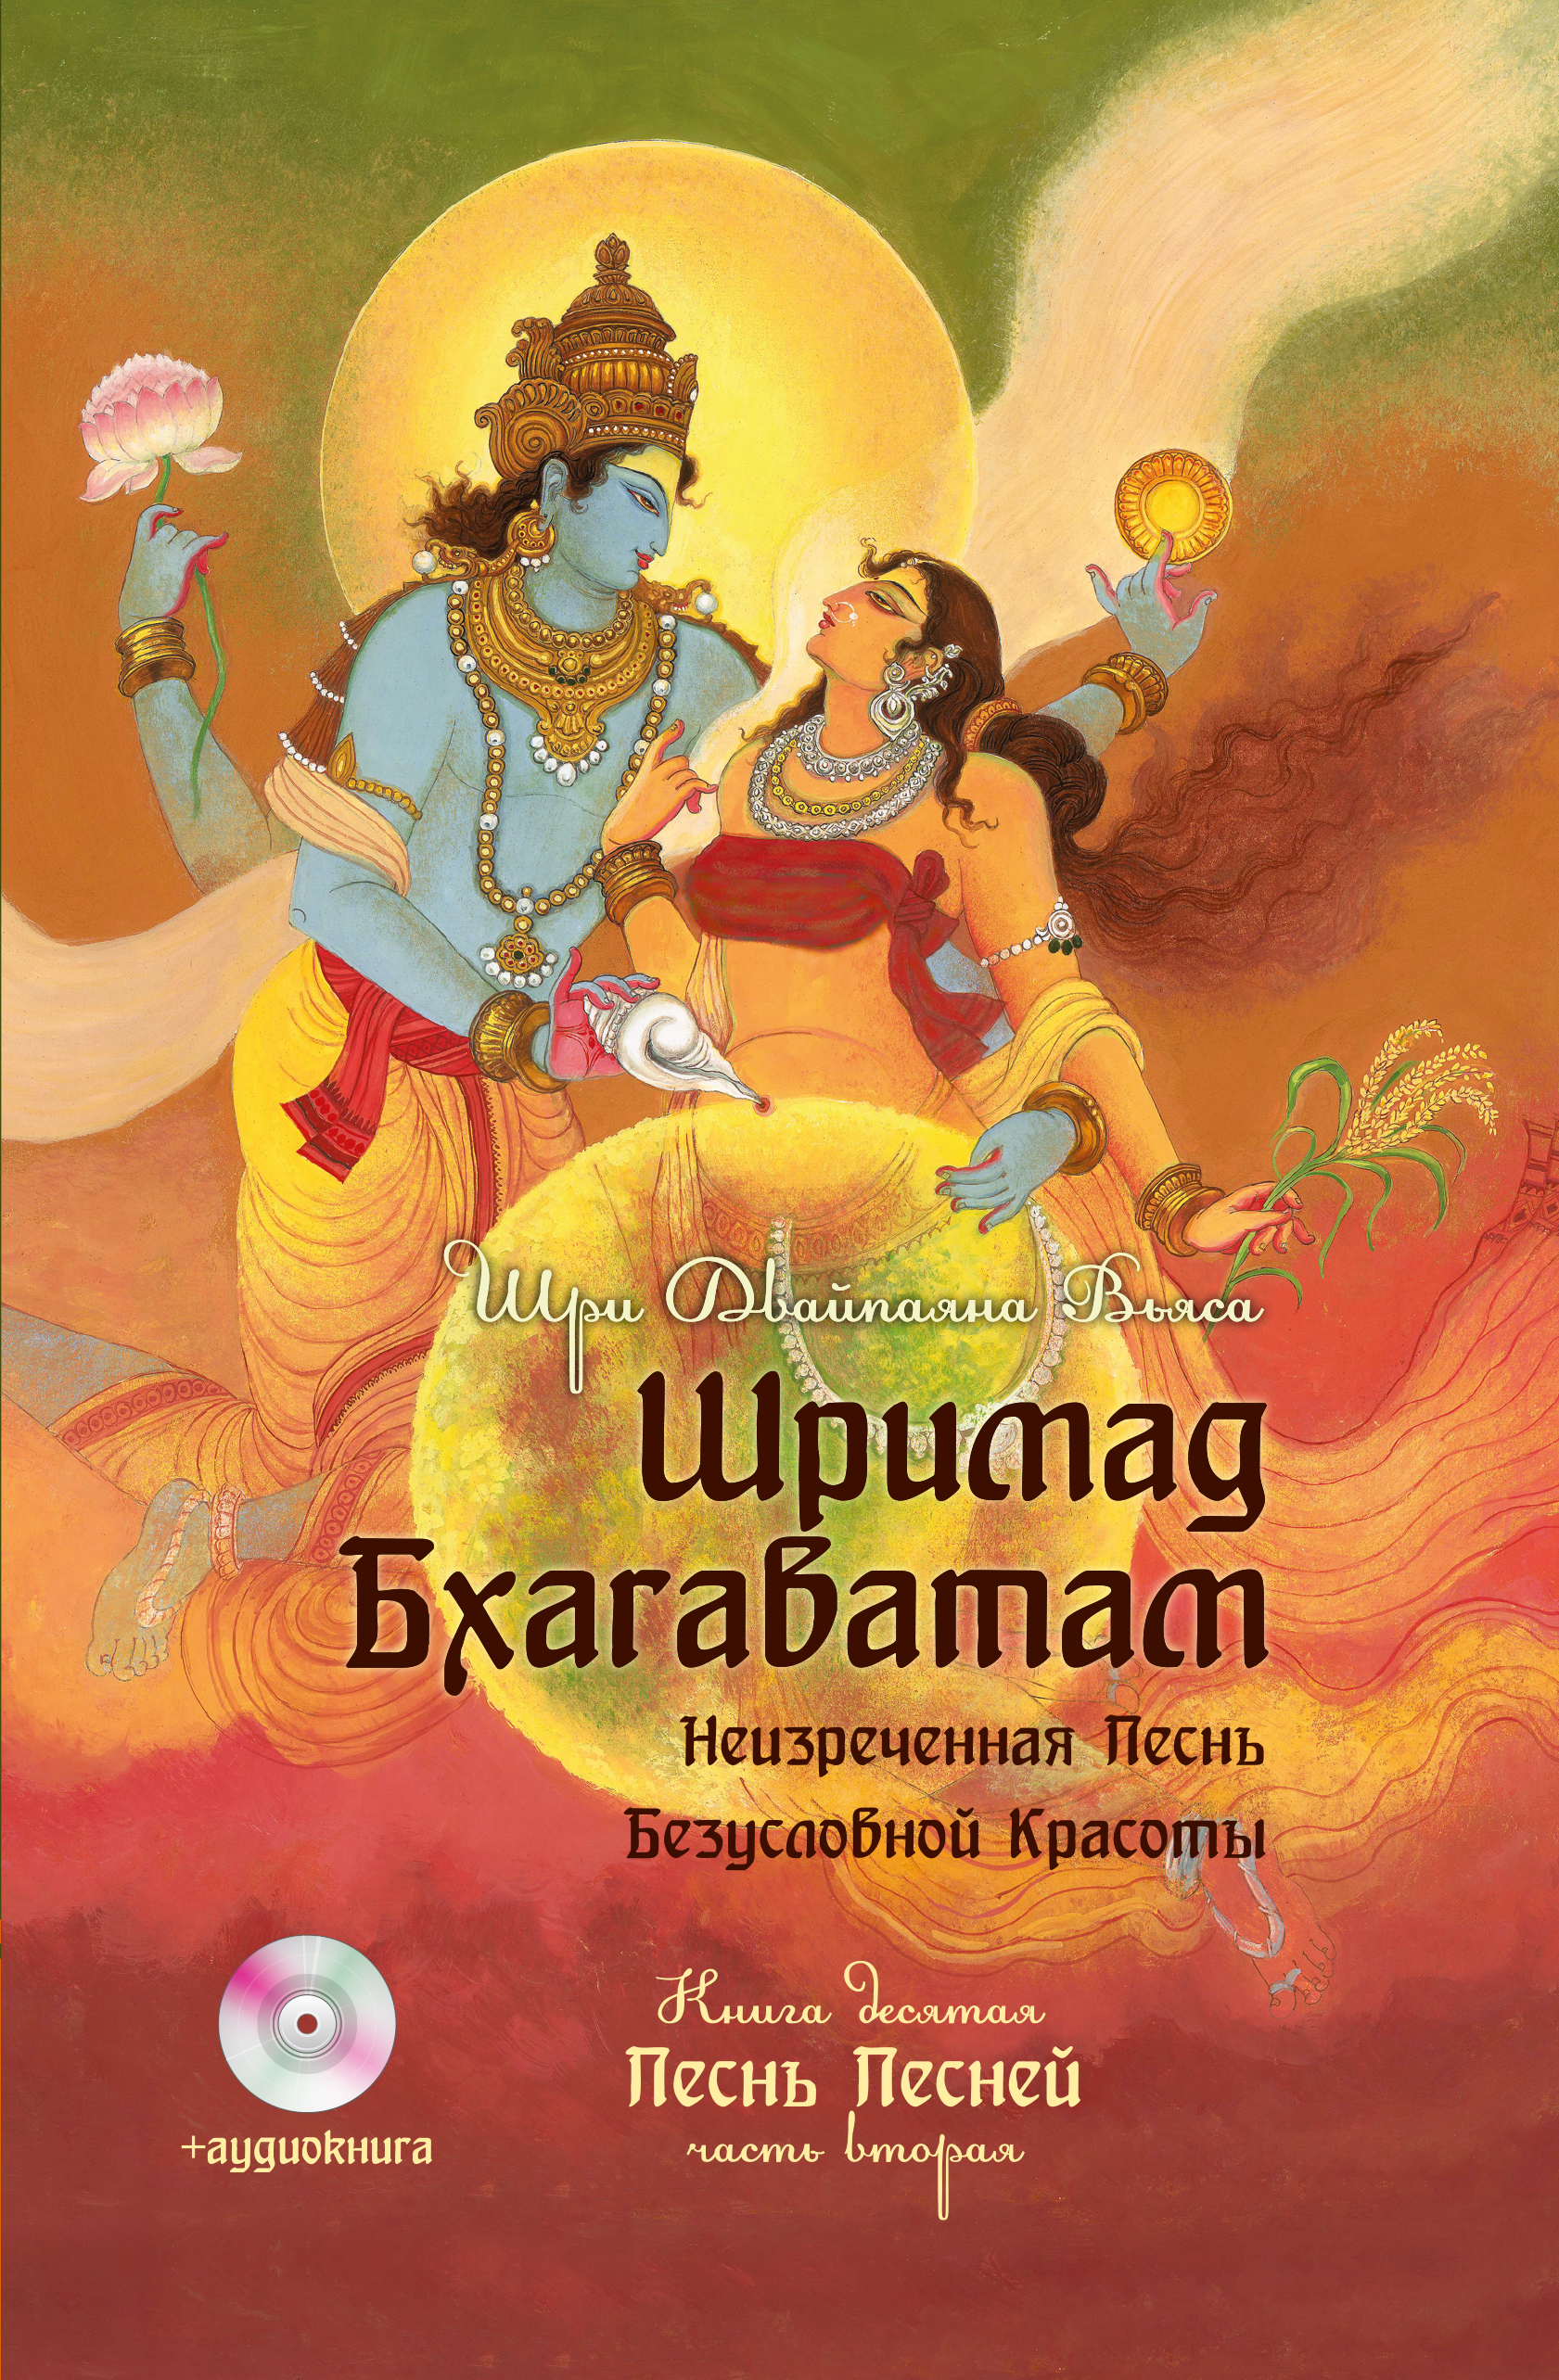 Шримад Бхагаватам. Кн. 10. Часть 2 + CD MP3 диск